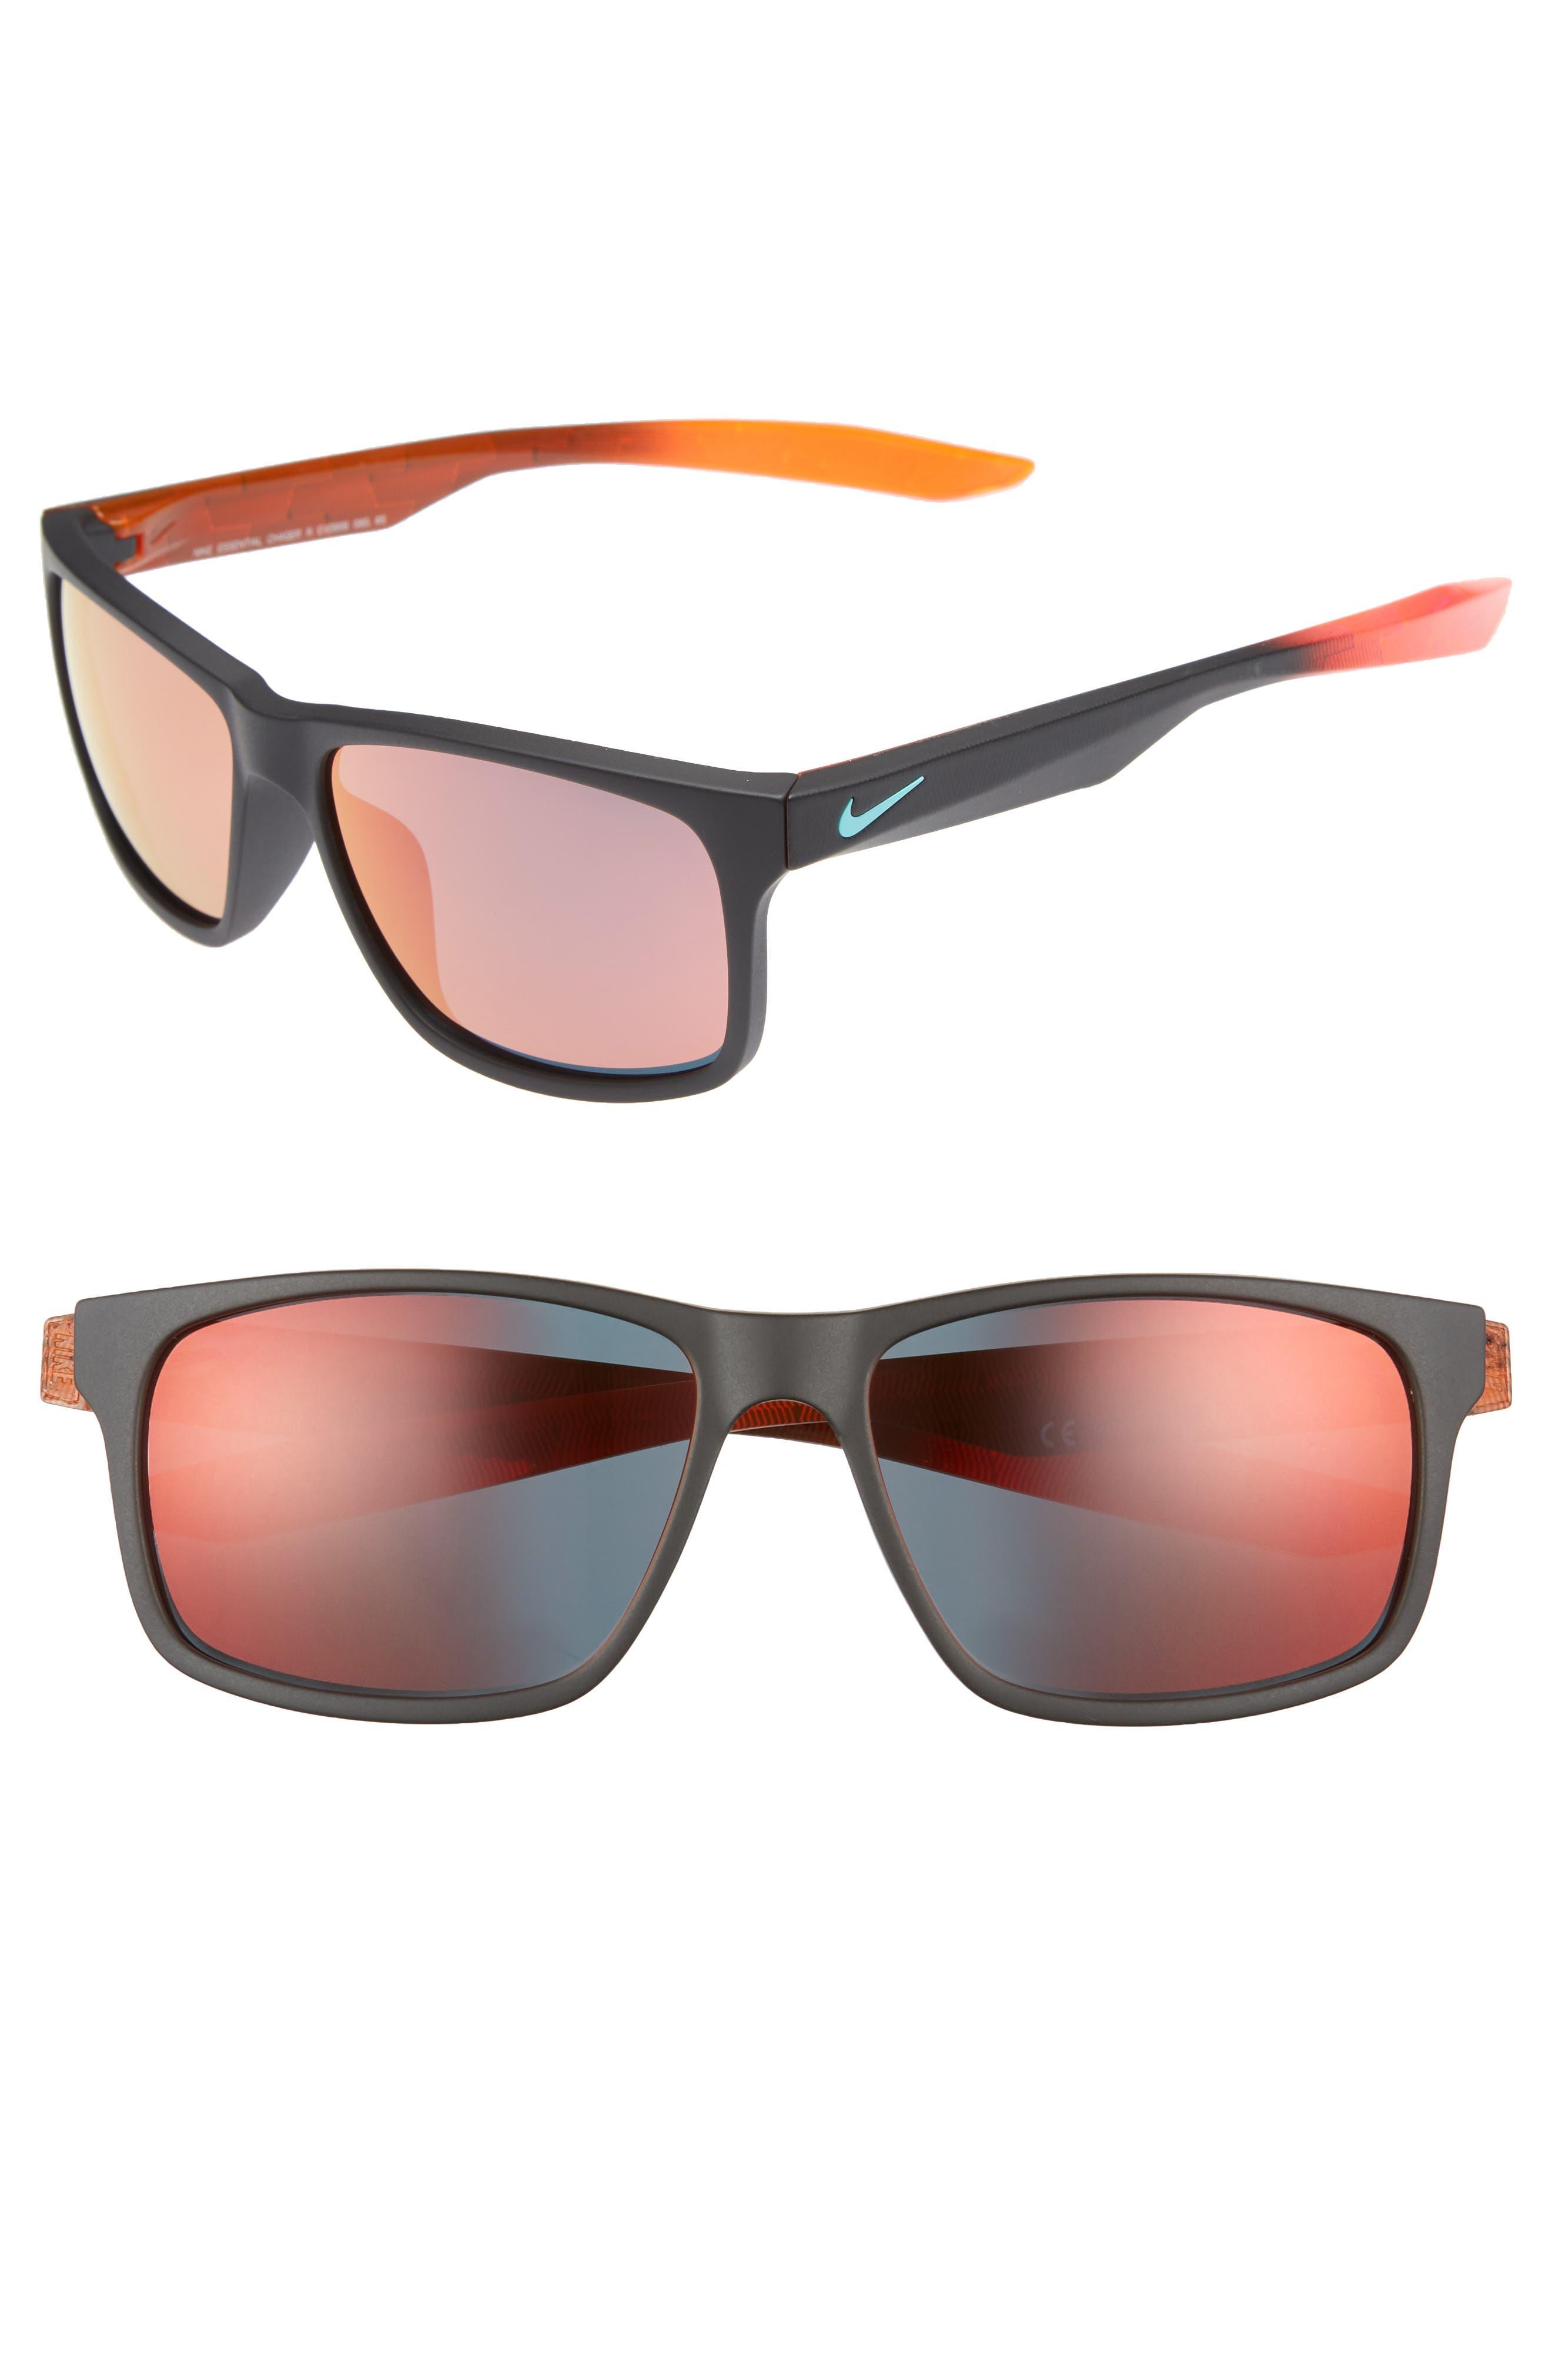 Essential Chaser 57mm Reflective Sunglasses,                         Main,                         color, Matte Black/ Amaranthine